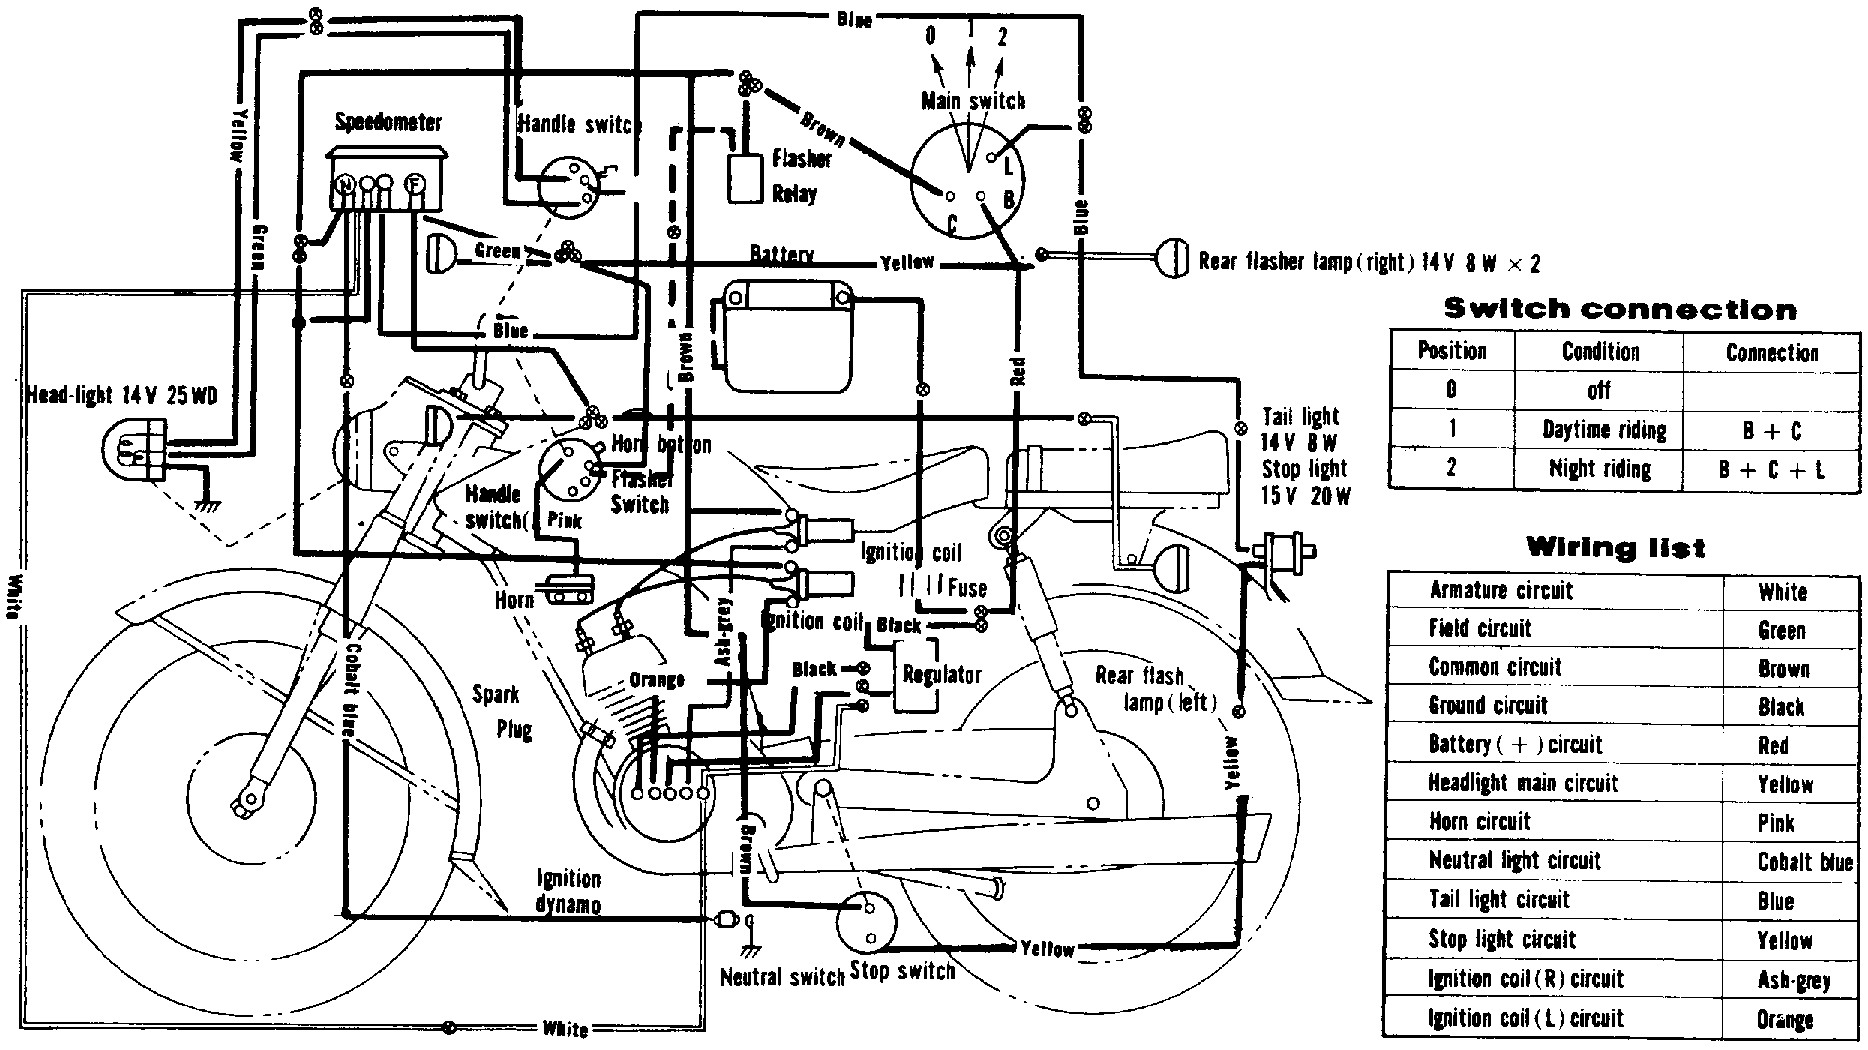 yamaha engine schematics wiring diagram paper1971 yamaha engine diagram 19 [ 1868 x 1050 Pixel ]